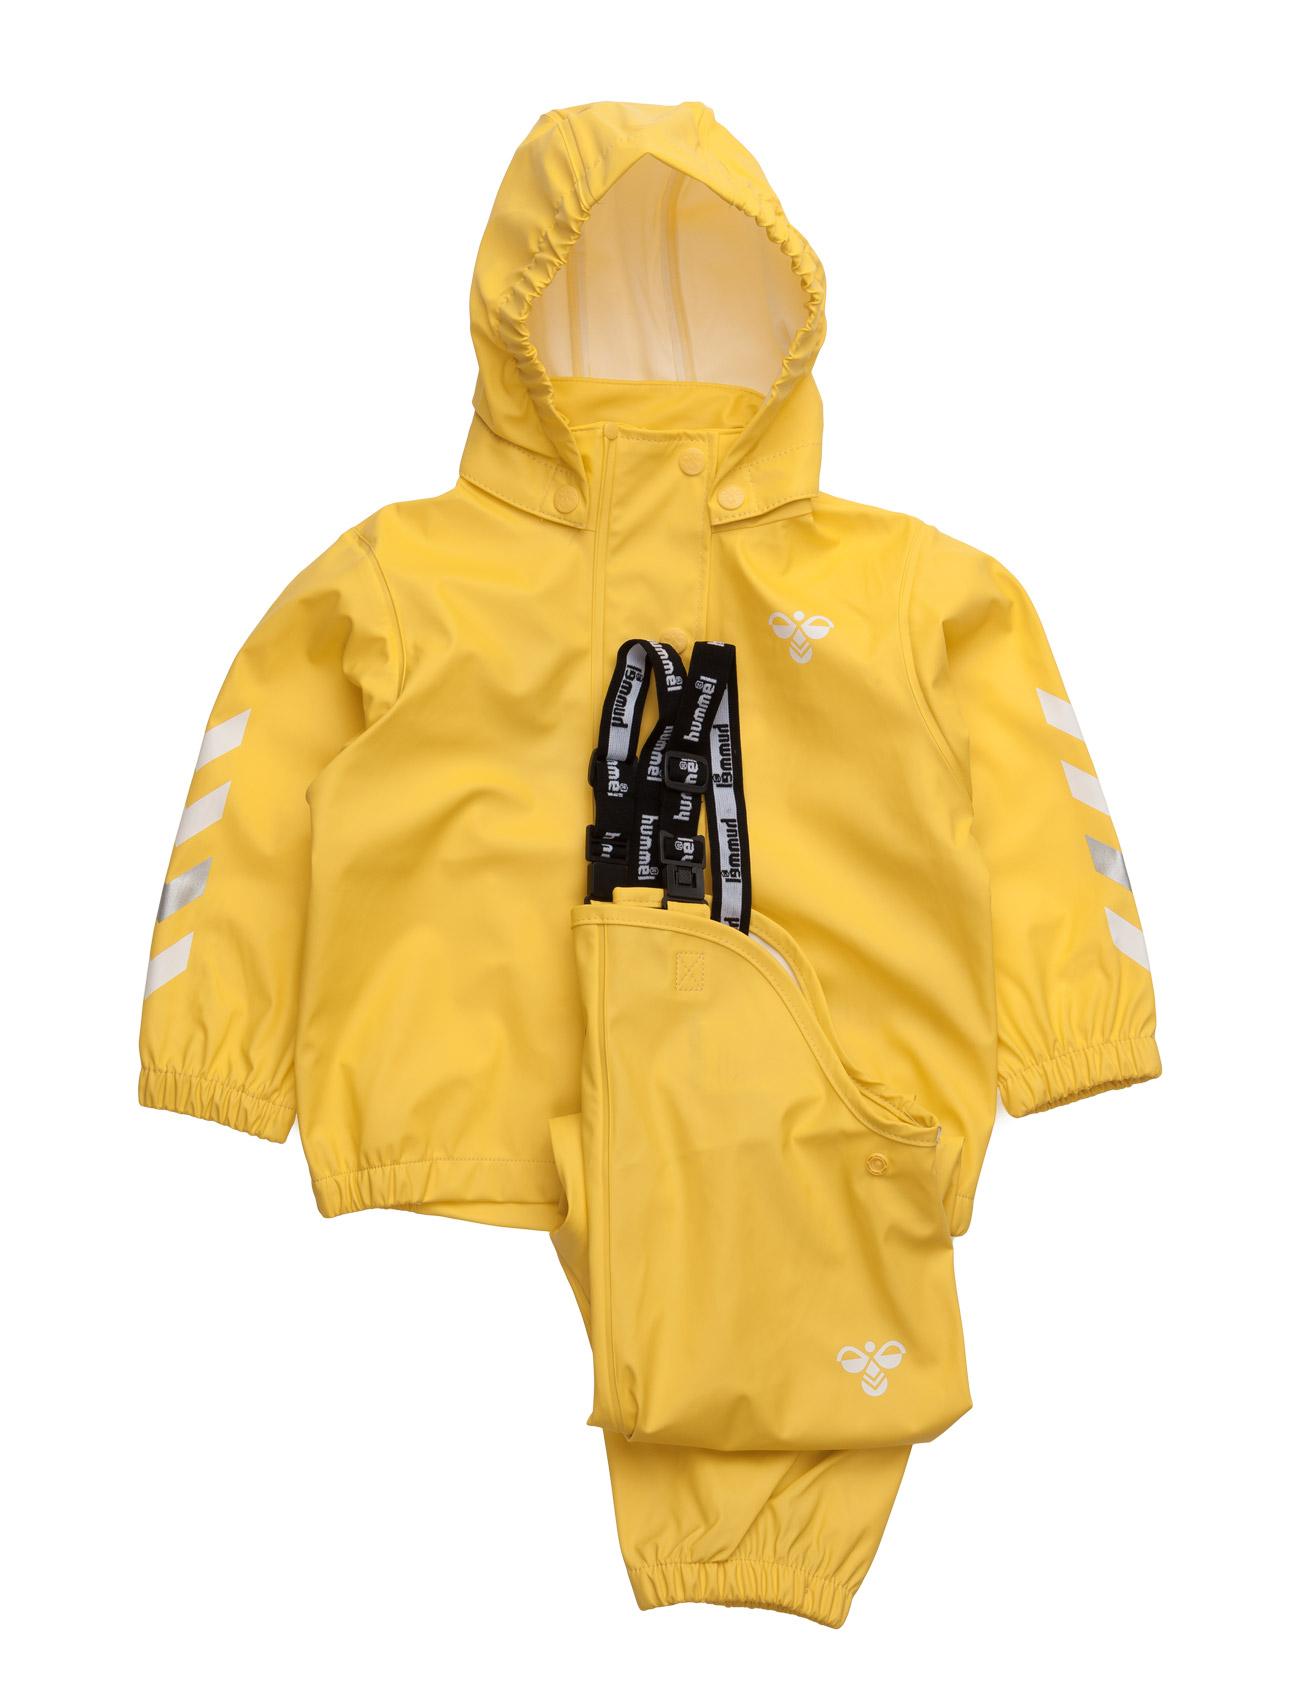 8b7e0bfe052 Reese Rainsuit Hummel Regntøj til Børn i | Unfairfashion.dk